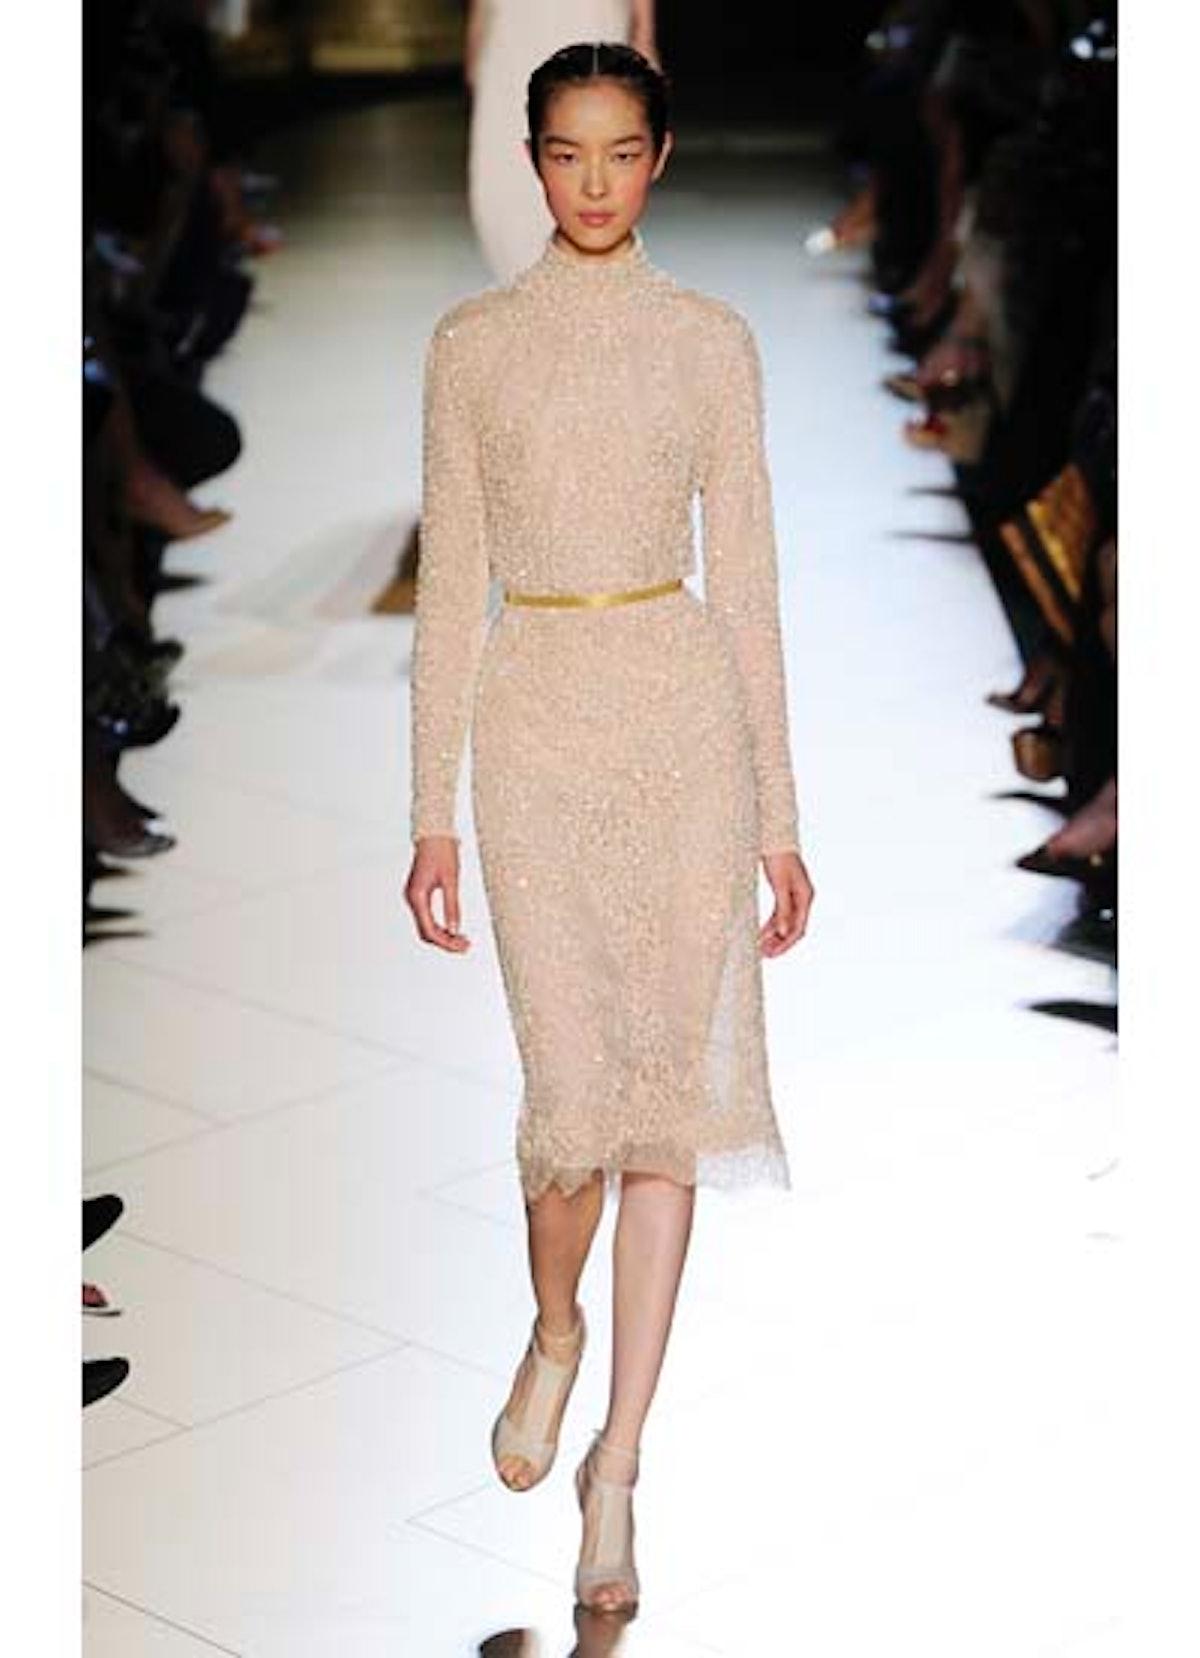 fass-elie-saab-couture-2012-runway-12-v.jpg